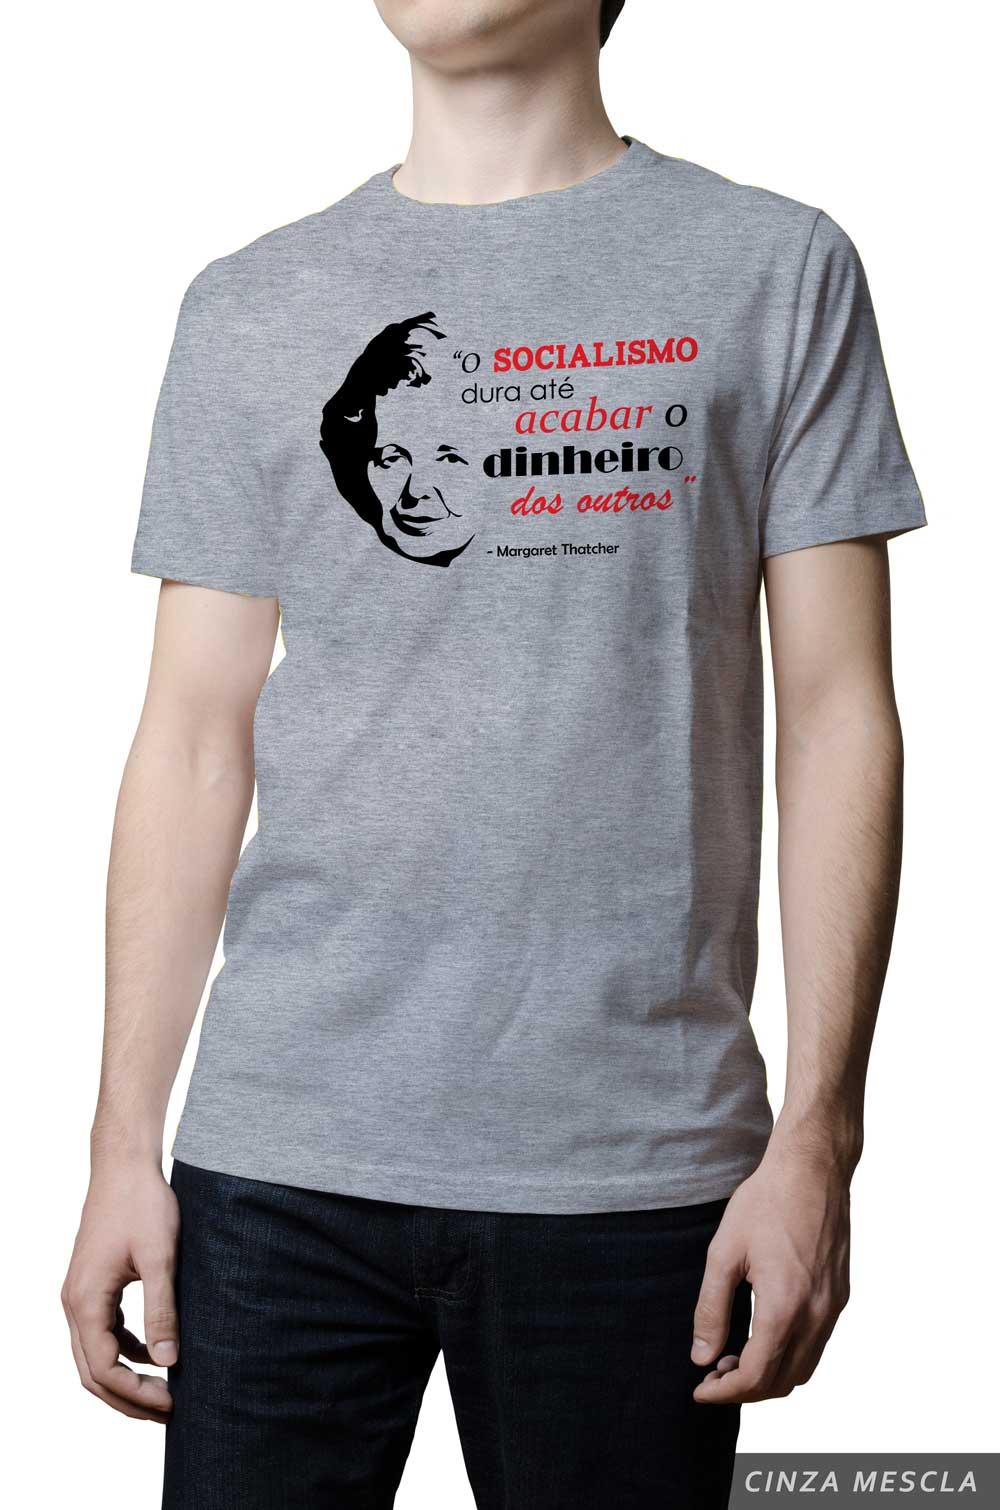 Camiseta - Margaret Thatcher - Socialismo